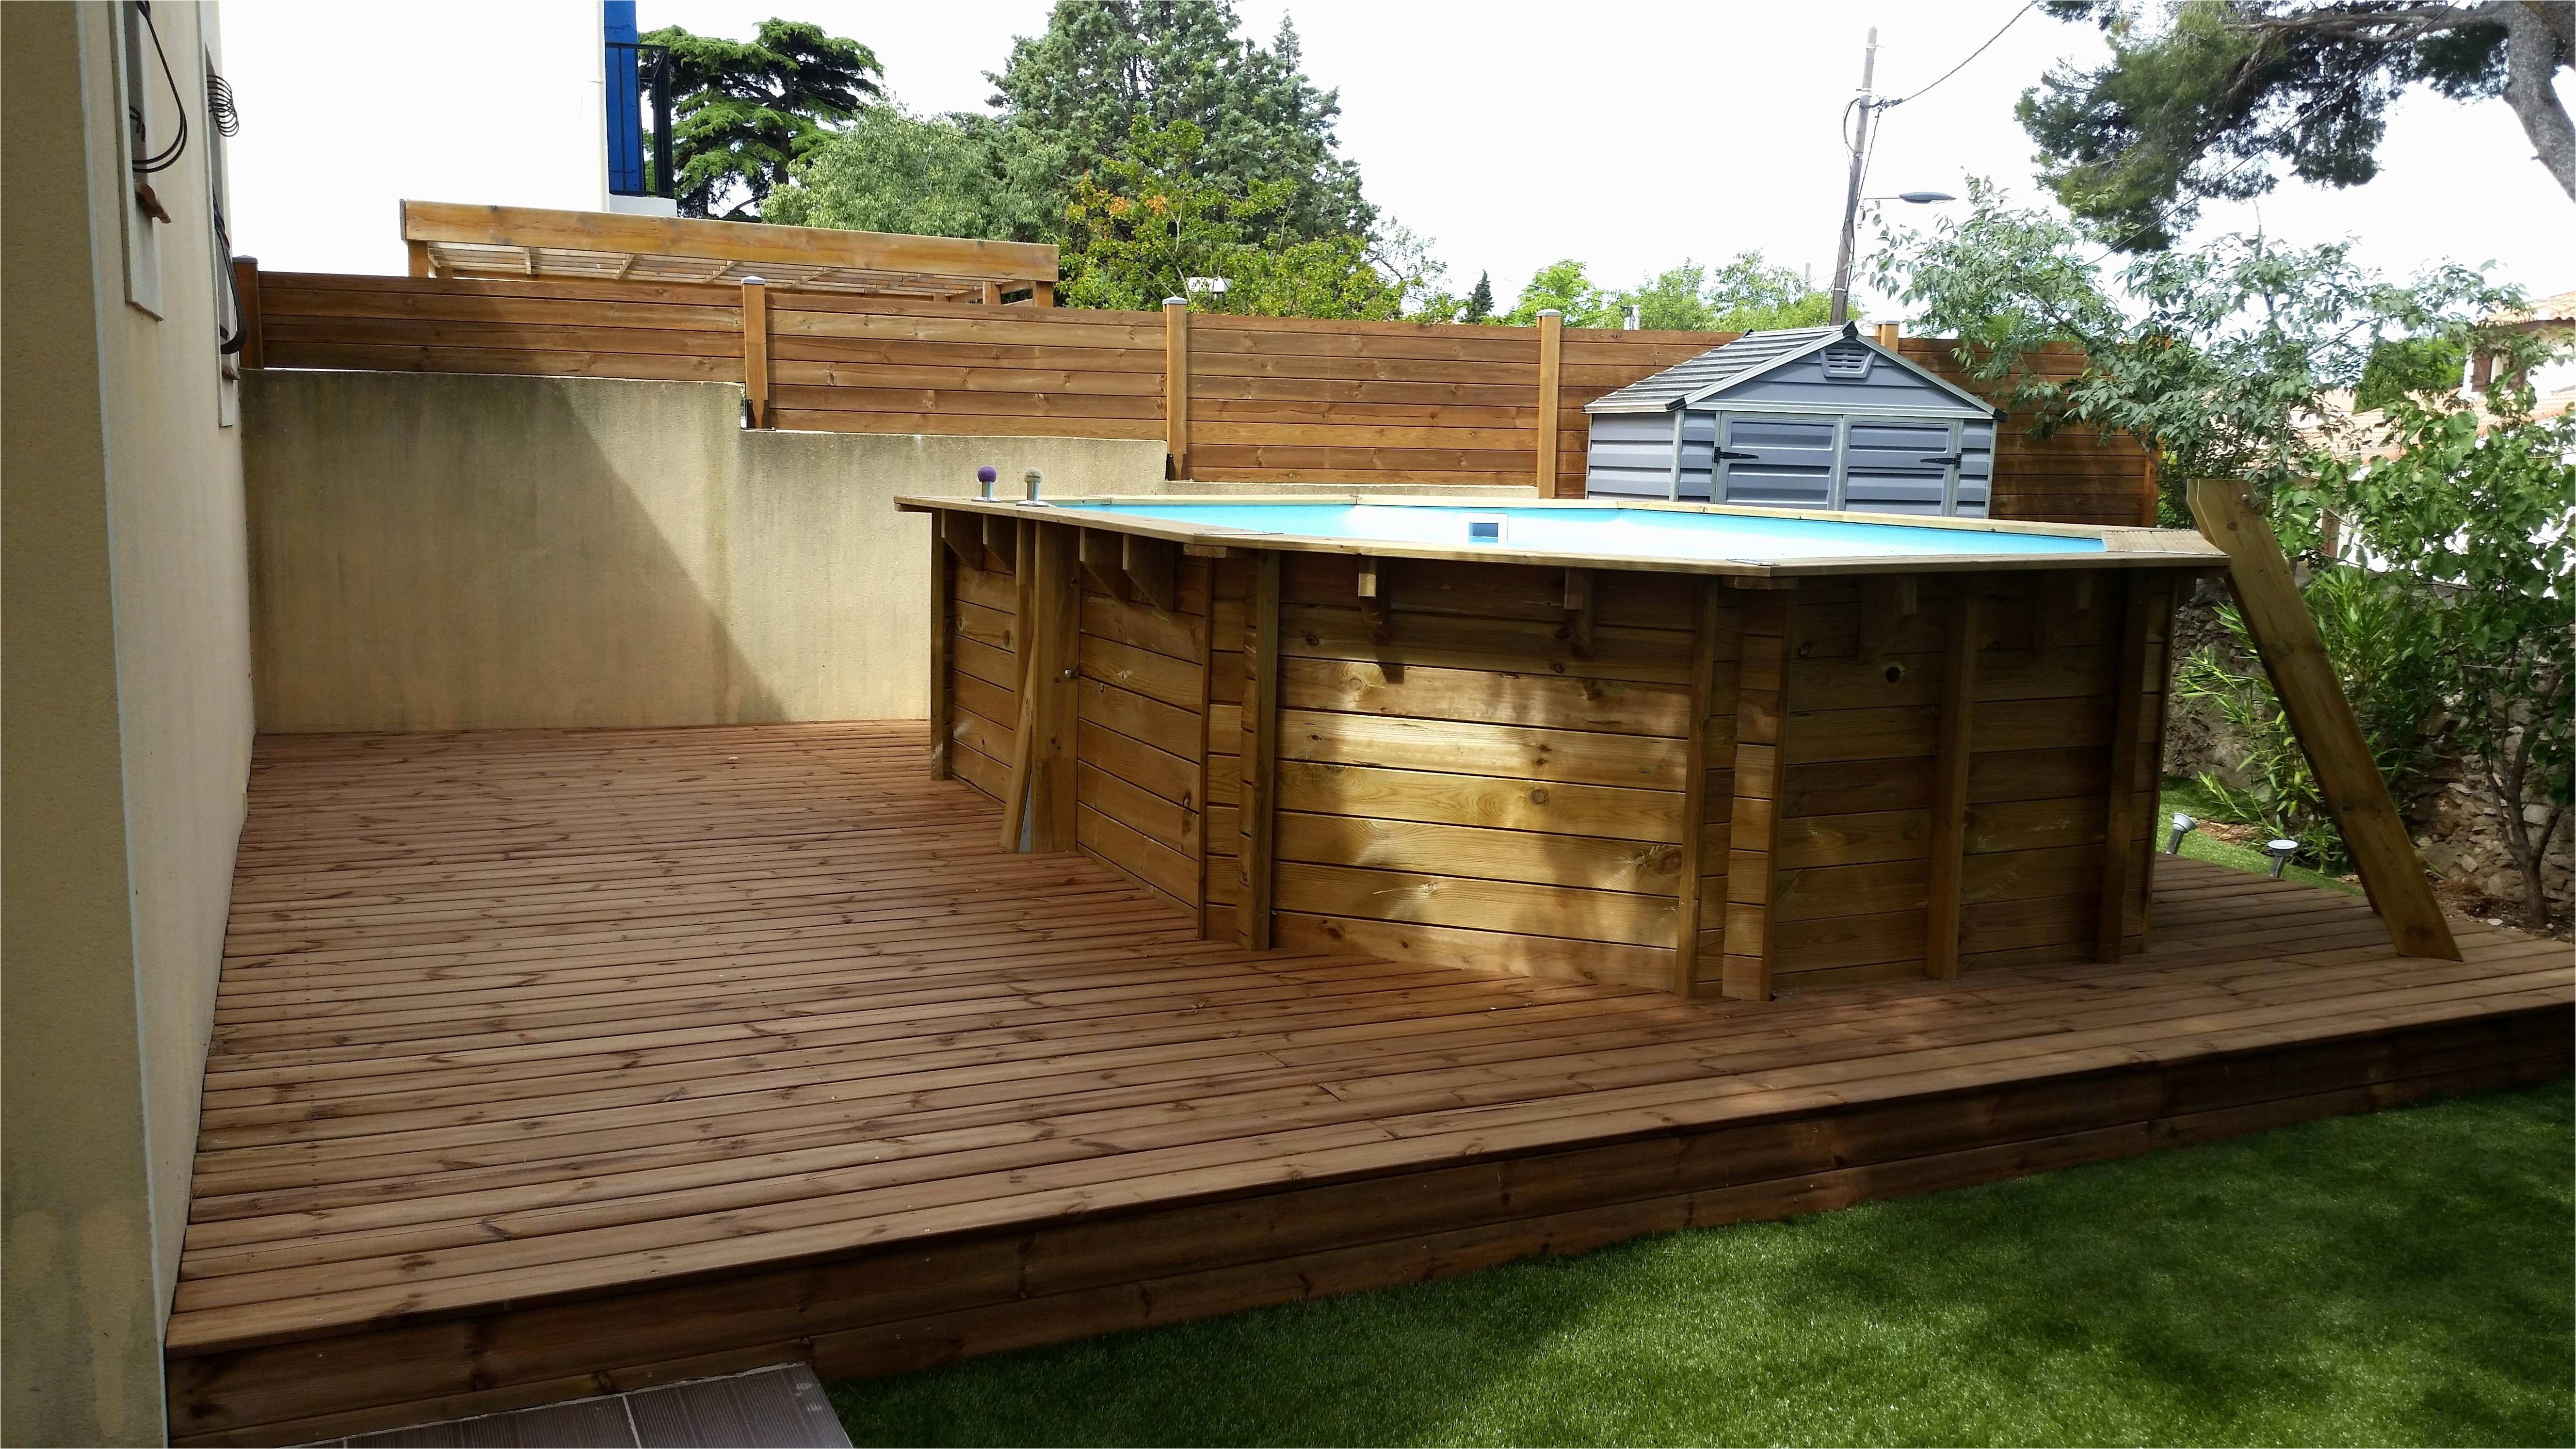 Amenagement terrasse avec piscine hors sol veranda - Piscine hors sol avec escalier interieur ...